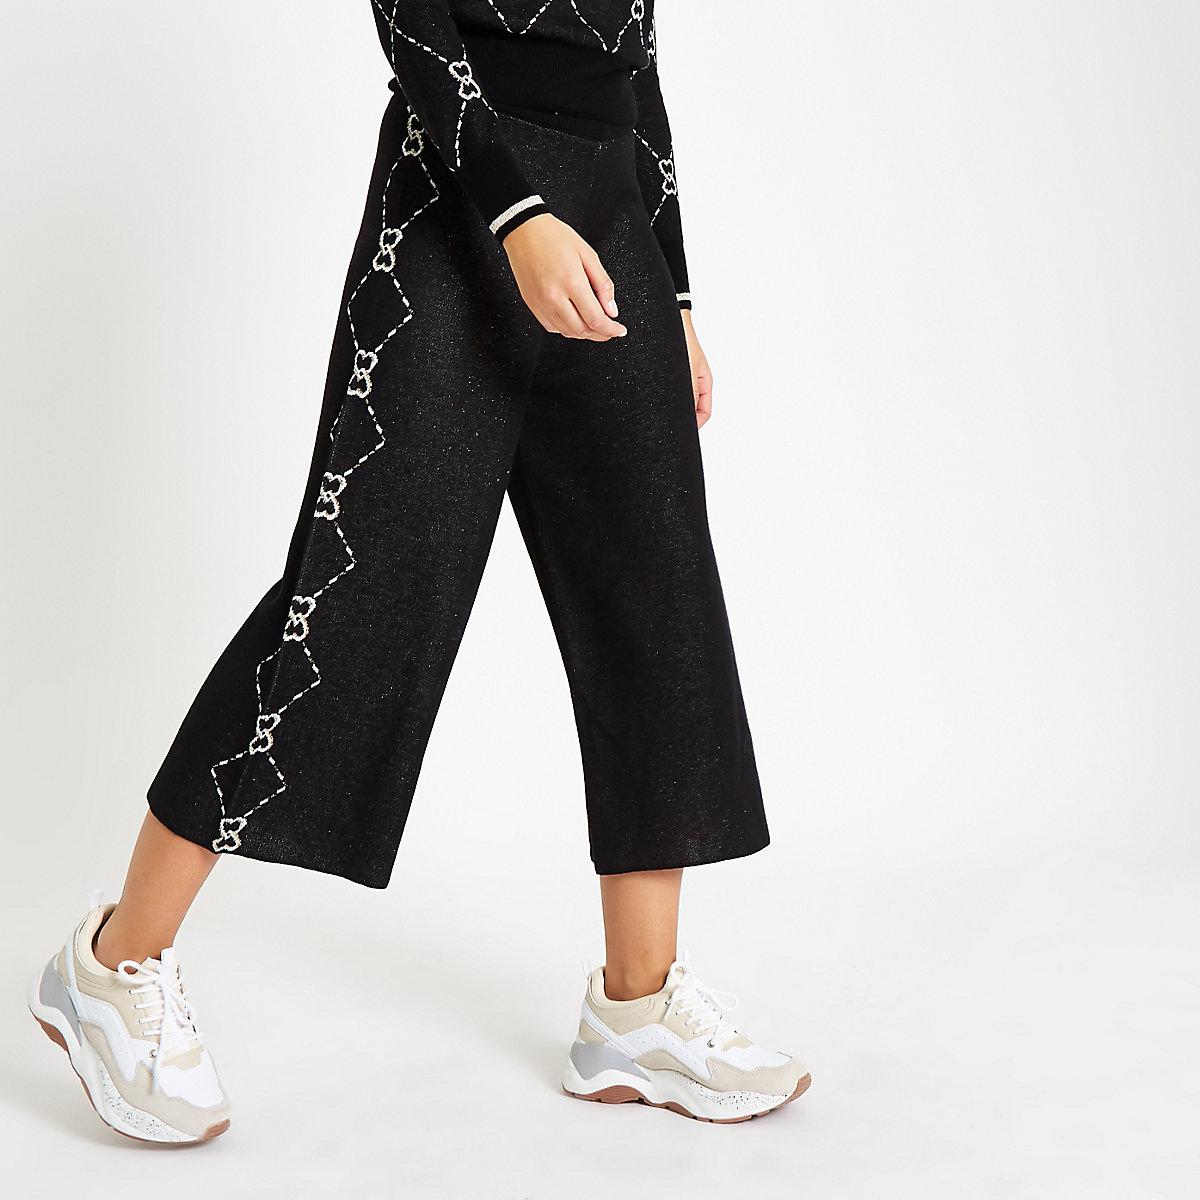 Black knit heart print metallic culottes